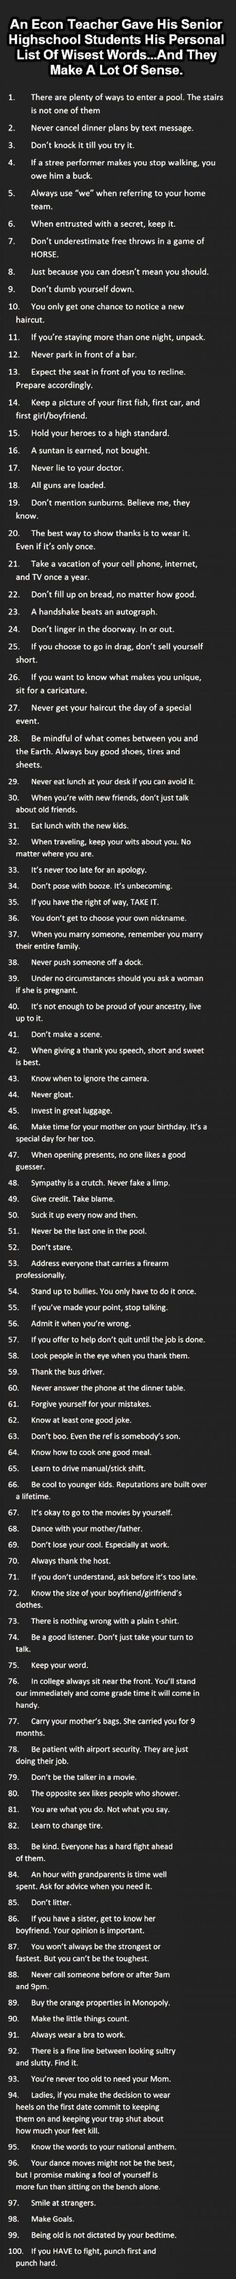 Wise words | DailyFailCenter